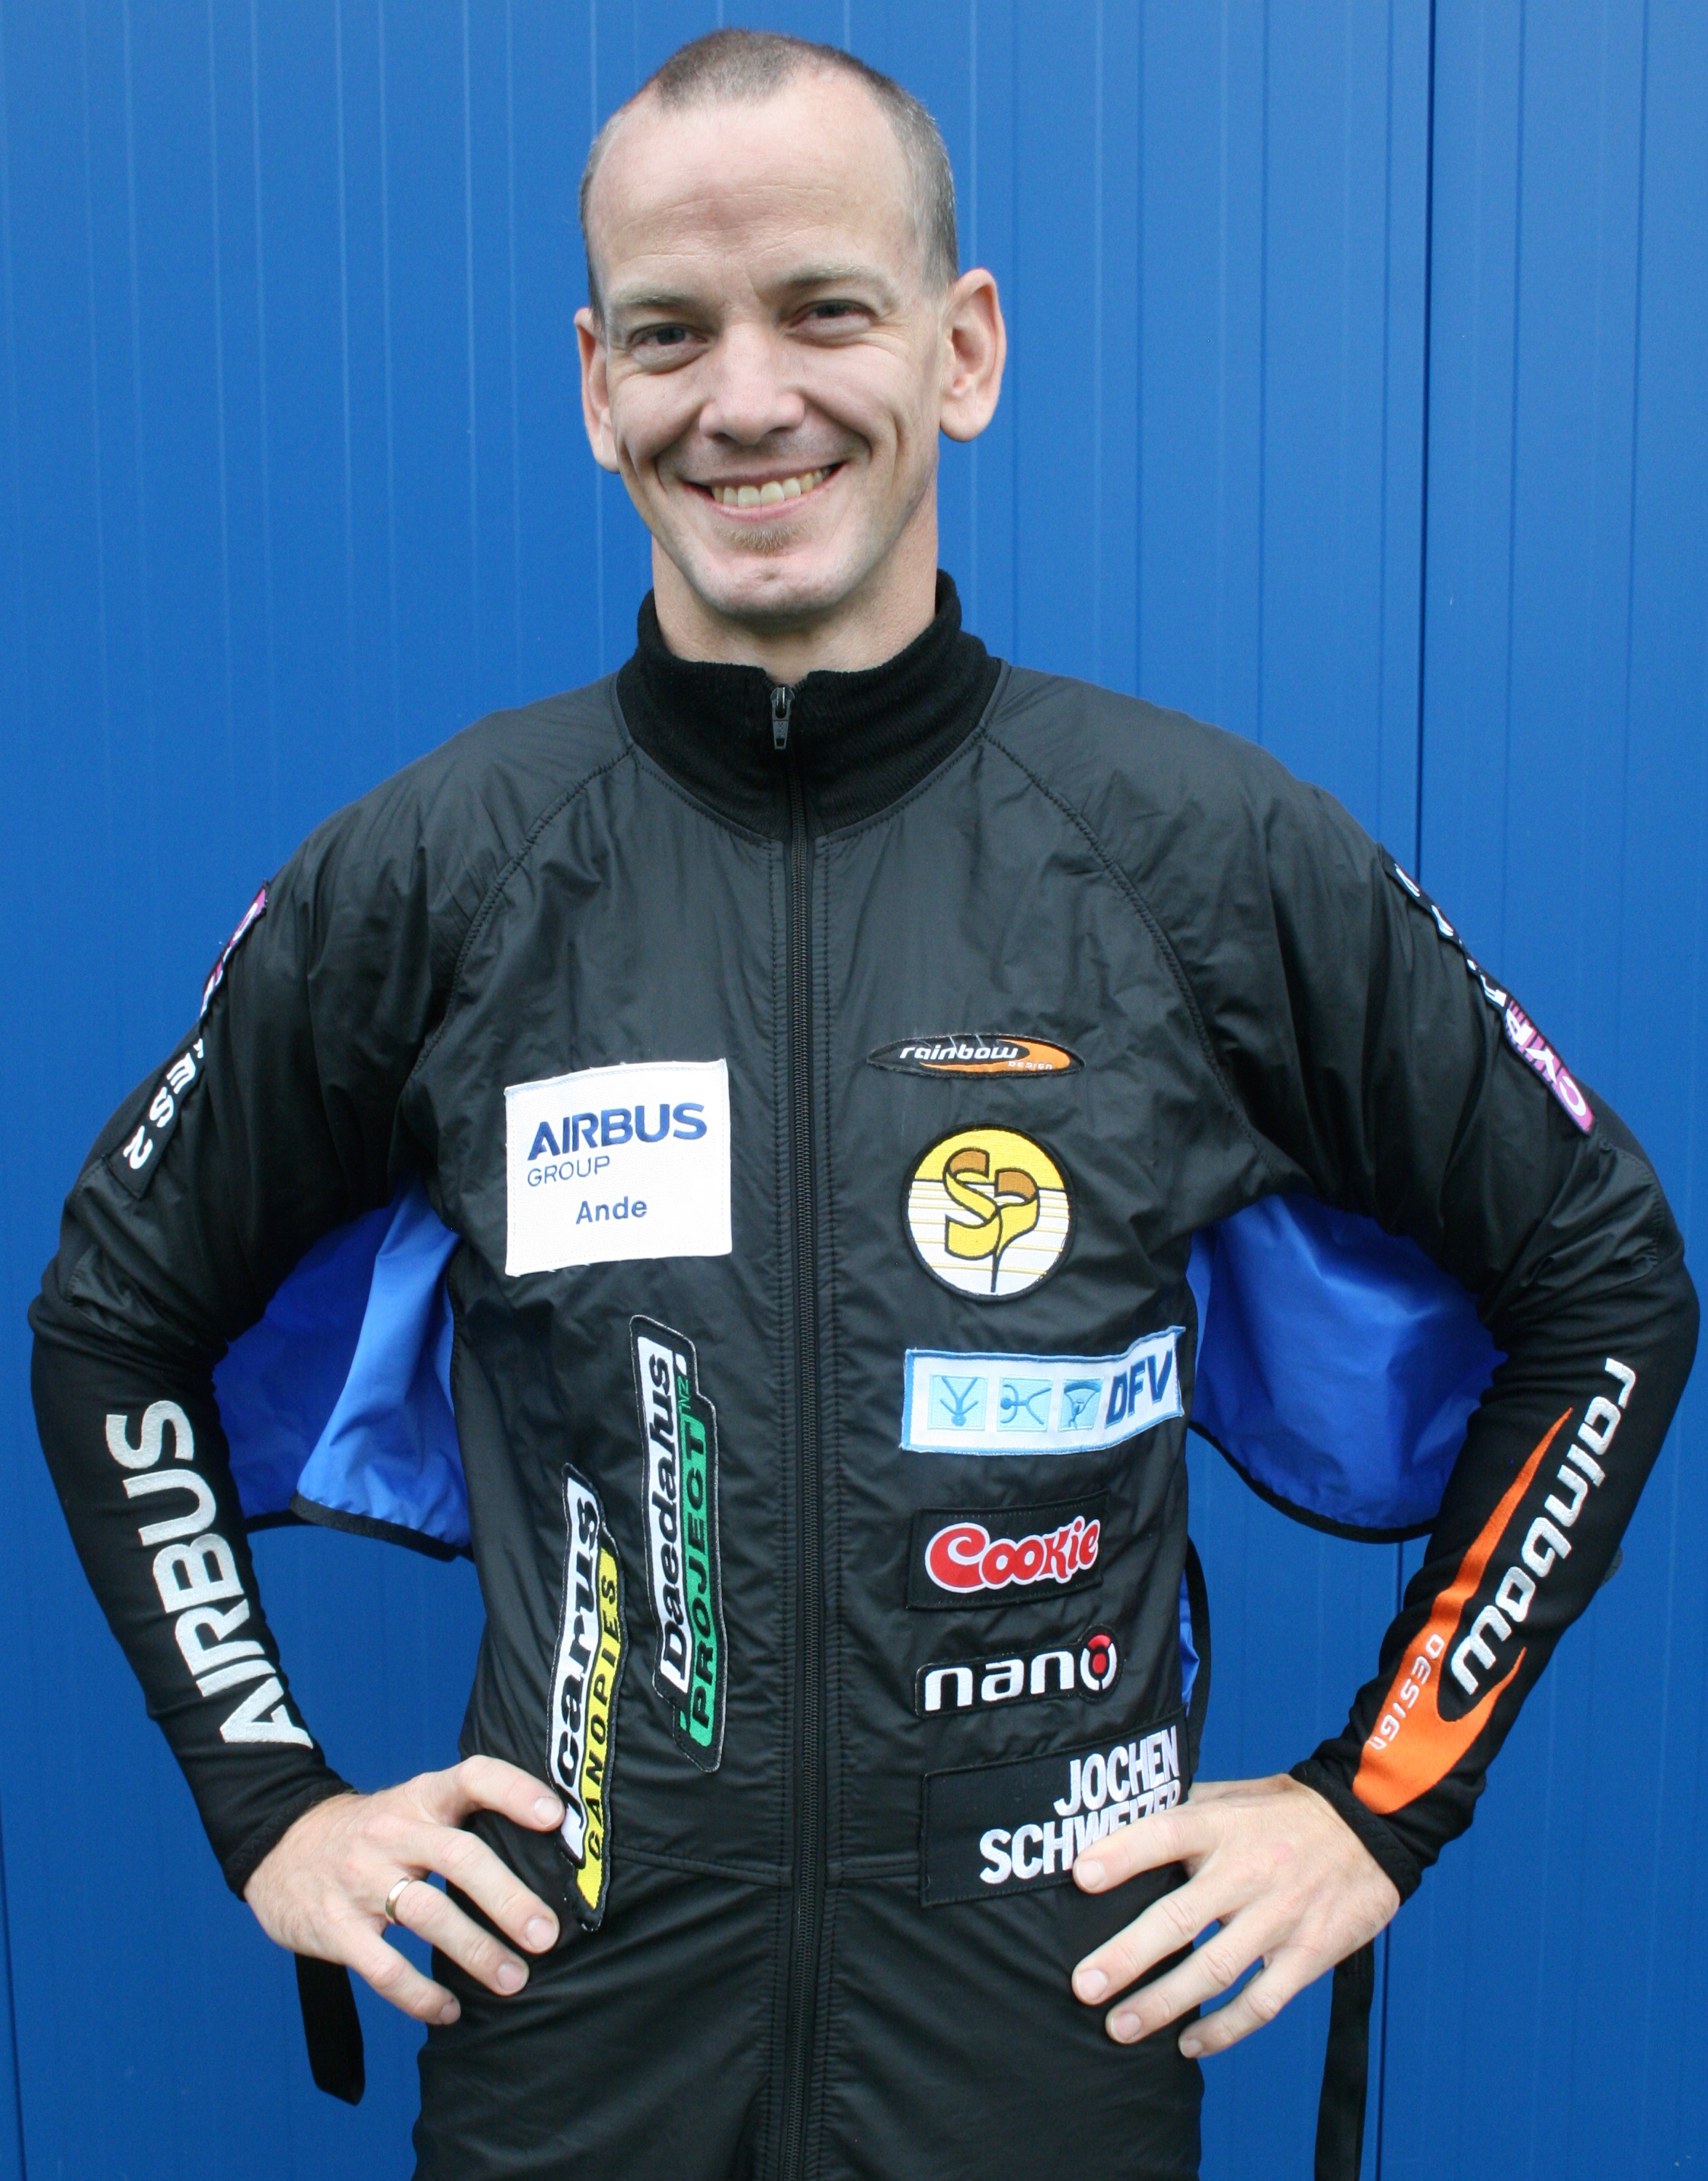 Andreas Trögele